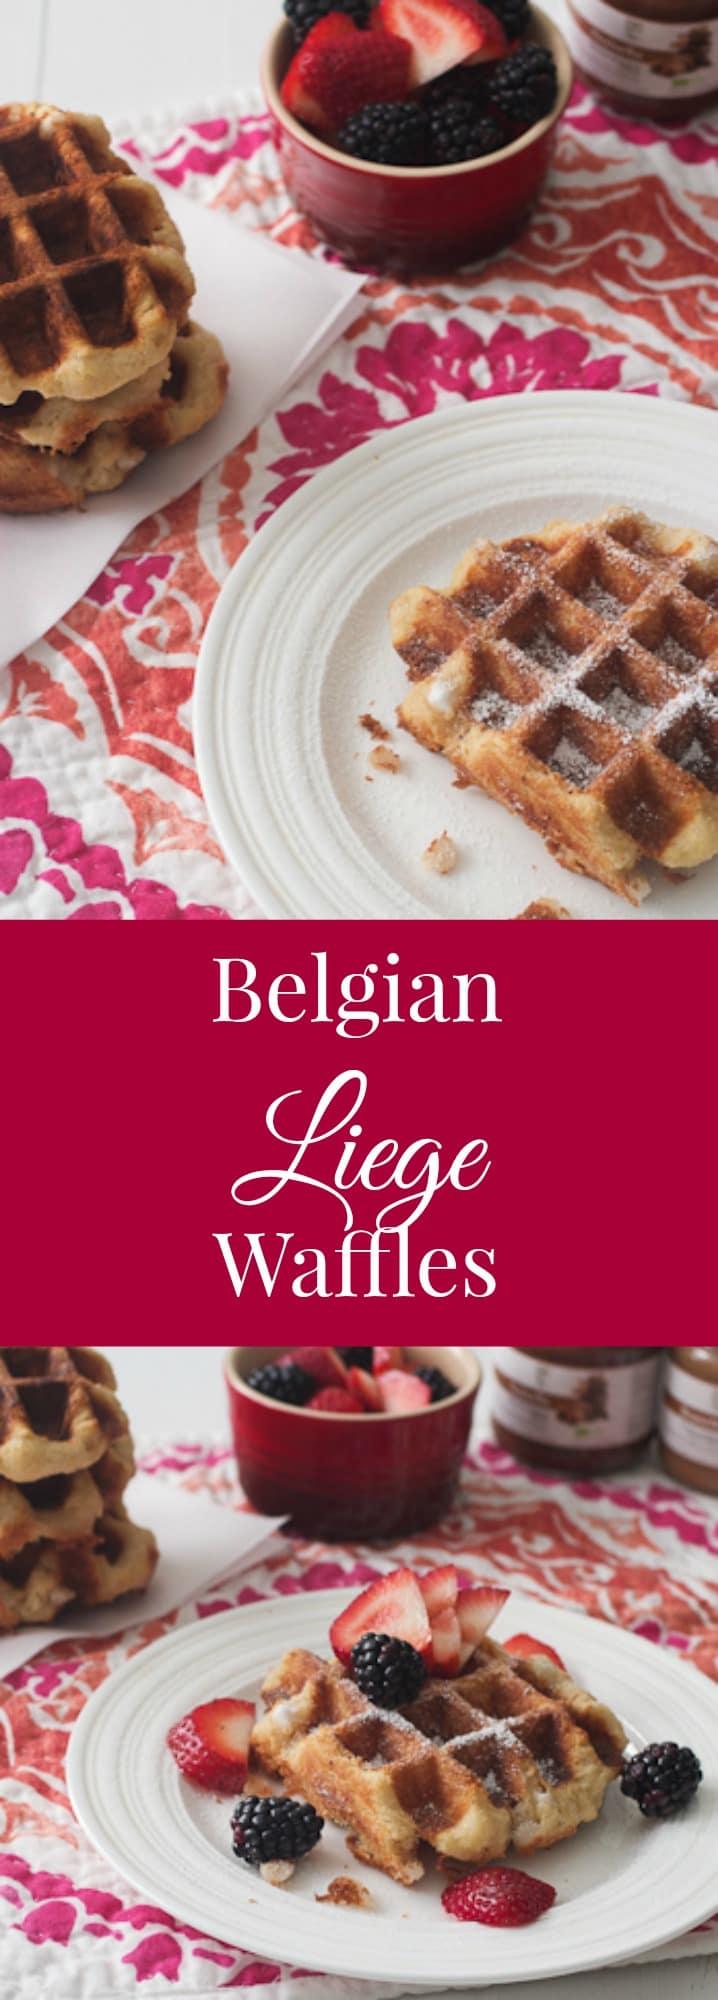 Belgian Liege Waffles | girlinthelittleredkitchen.com